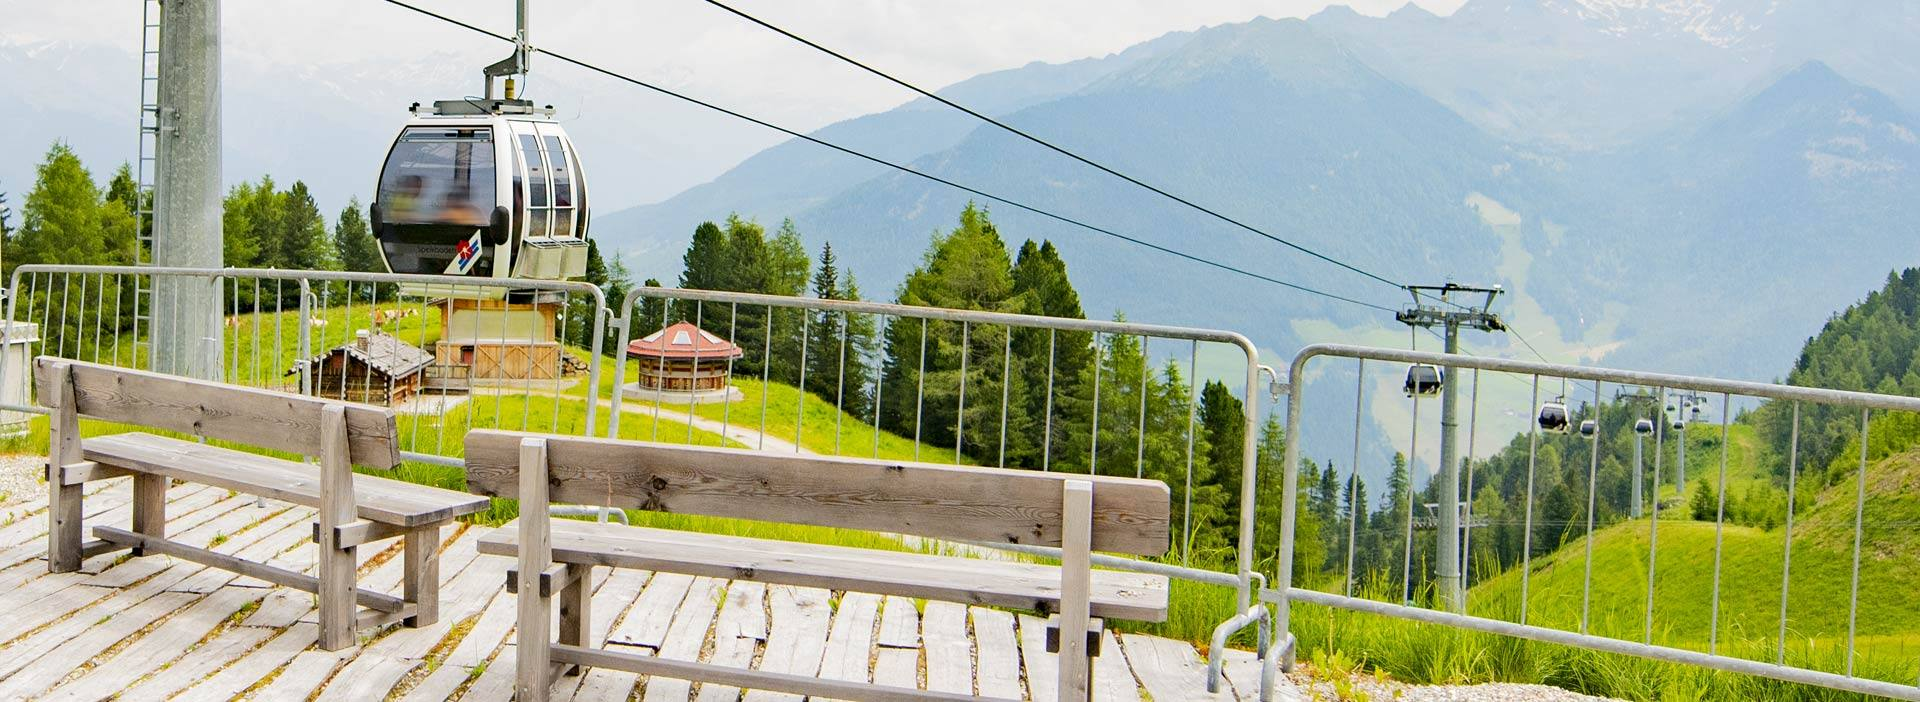 Speikboden Bergbahnen